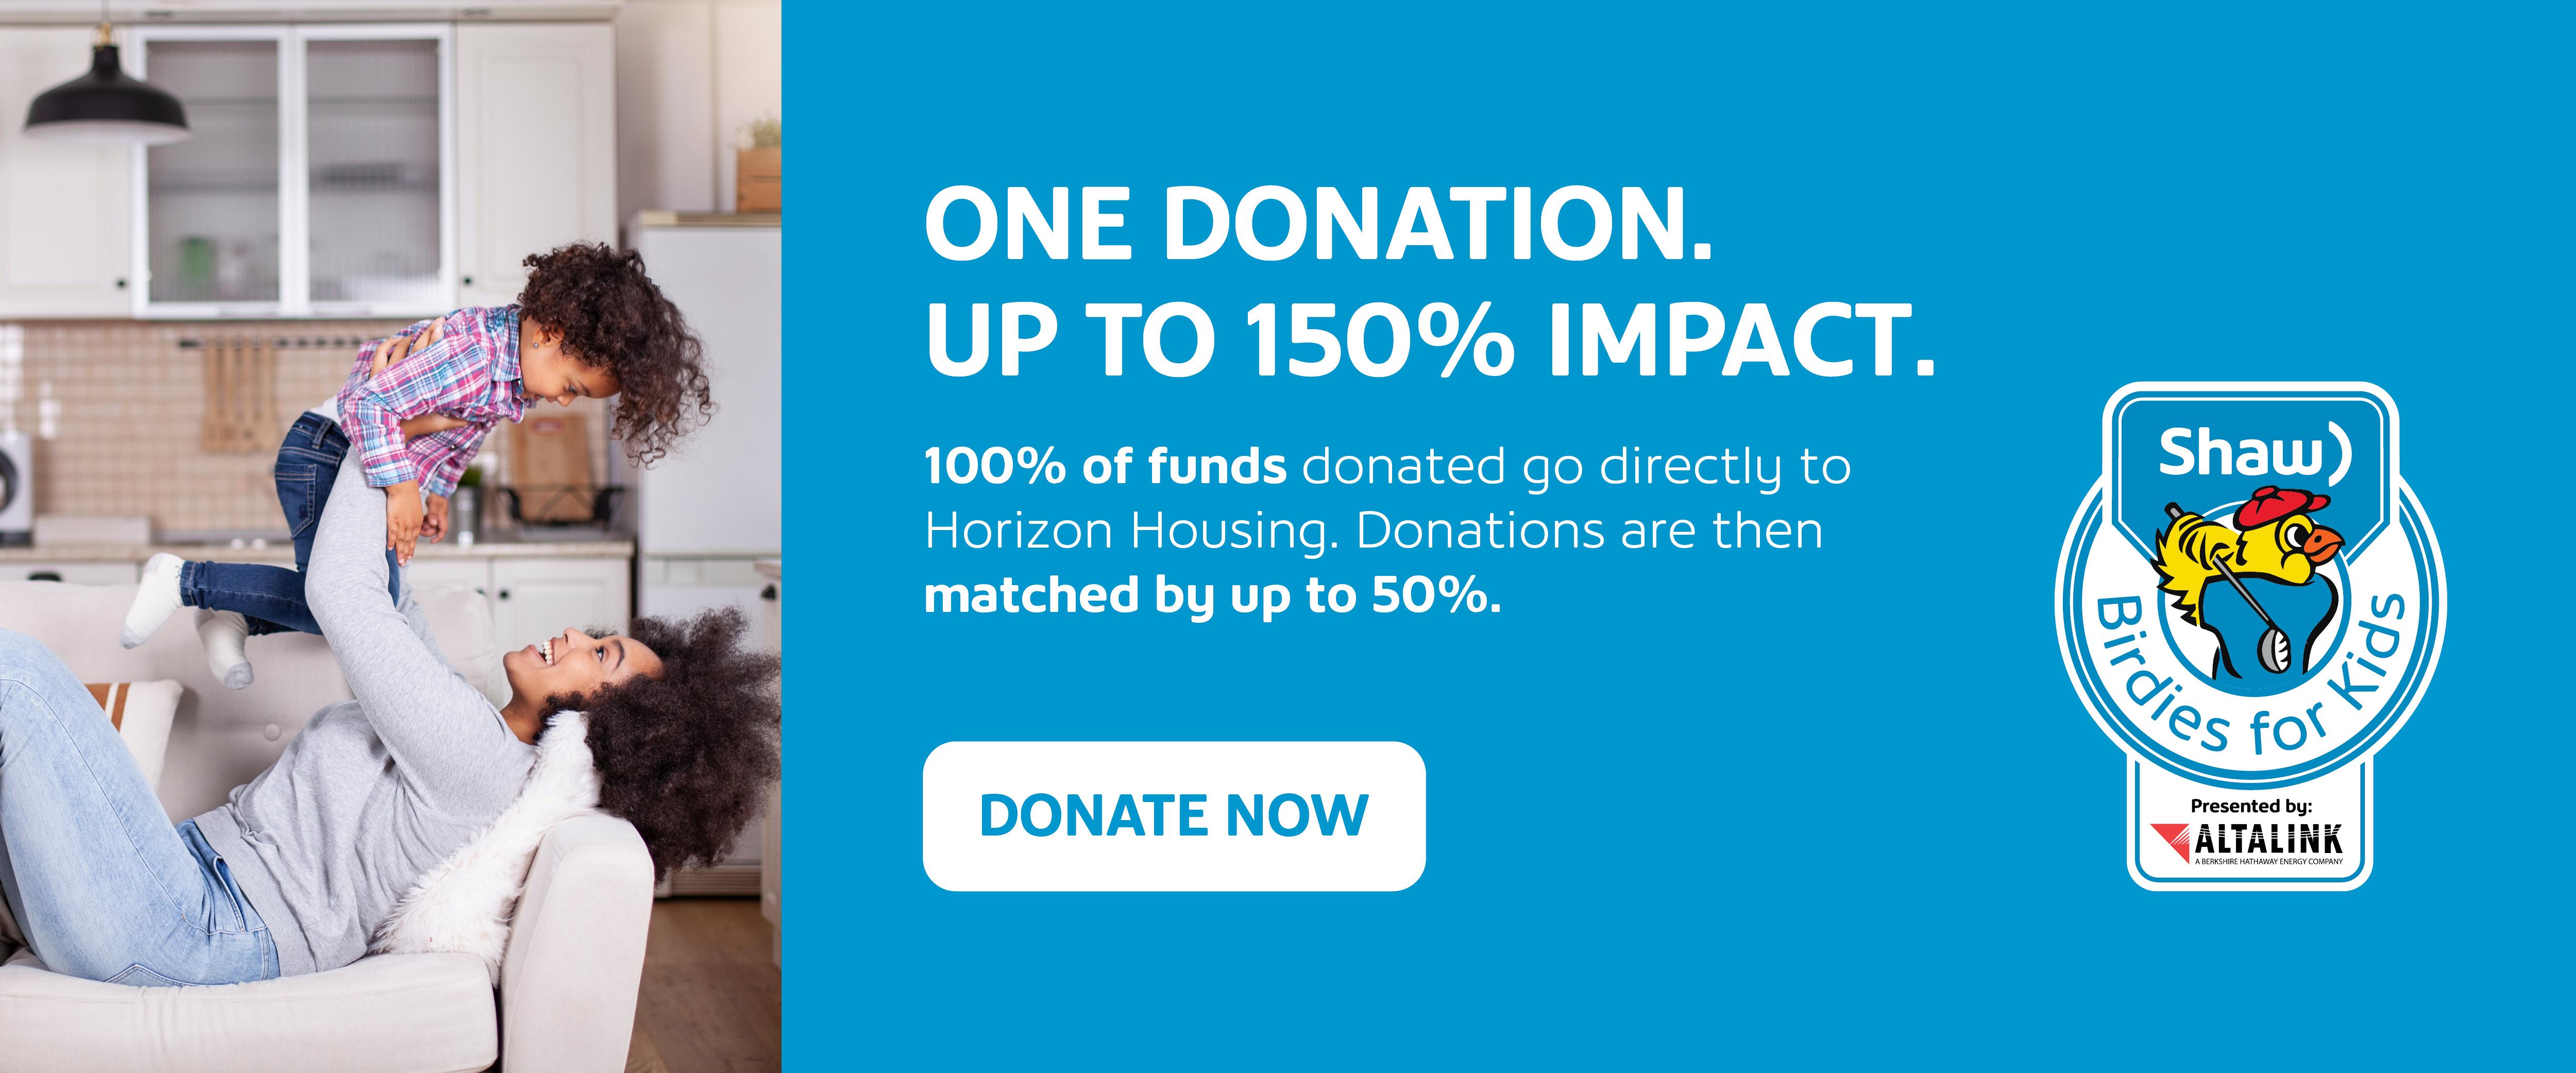 Donate through birdies for kids